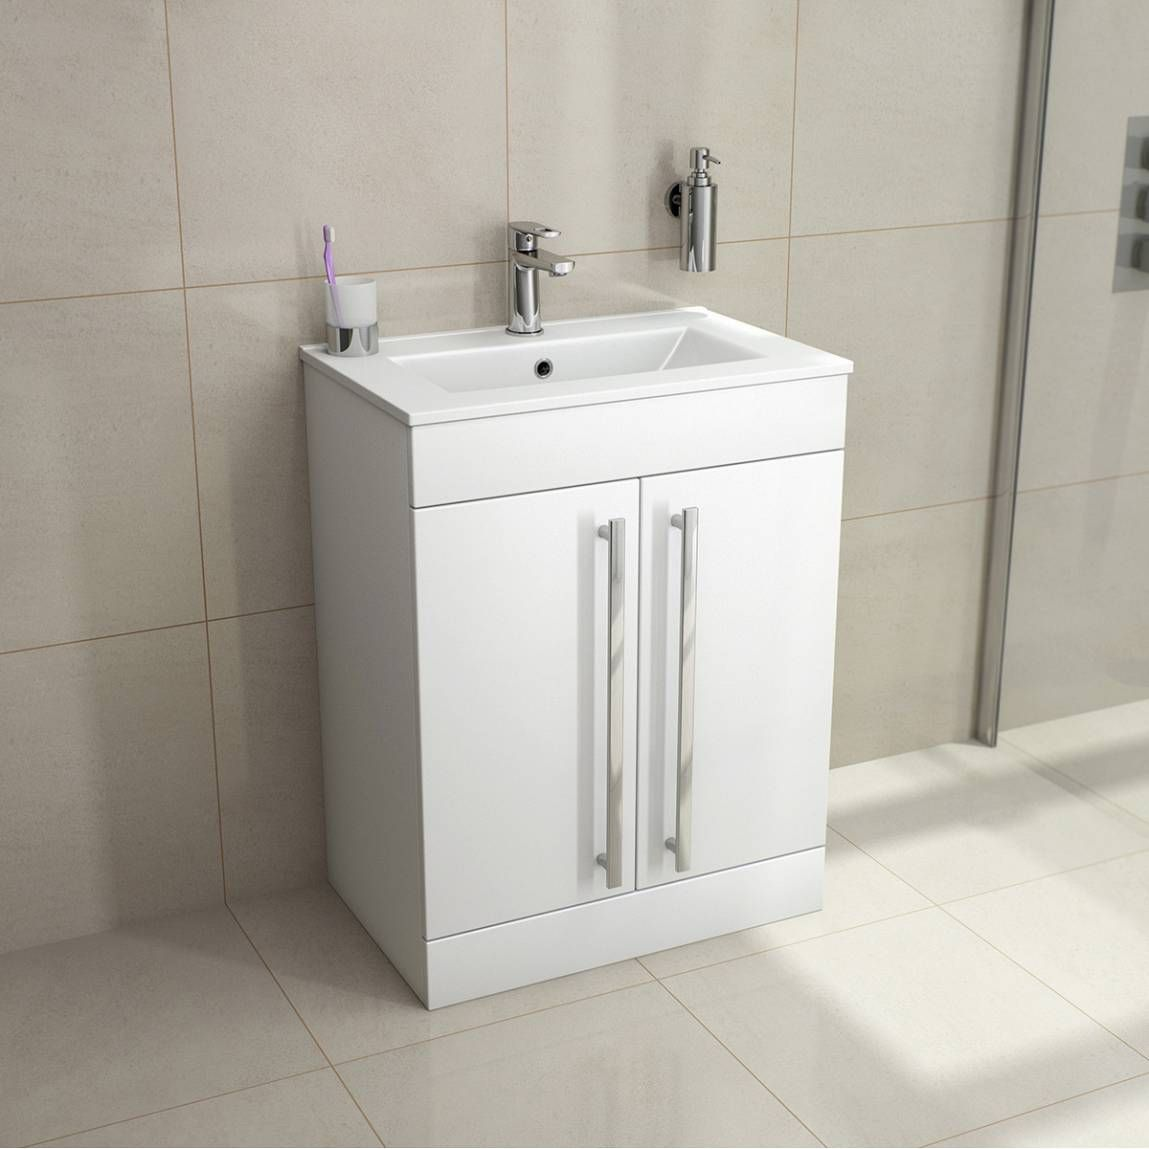 OdessaWhiteFloorMountedDoorUnitBasin Shuva Pinterest - Bathroom vanities floor mounted